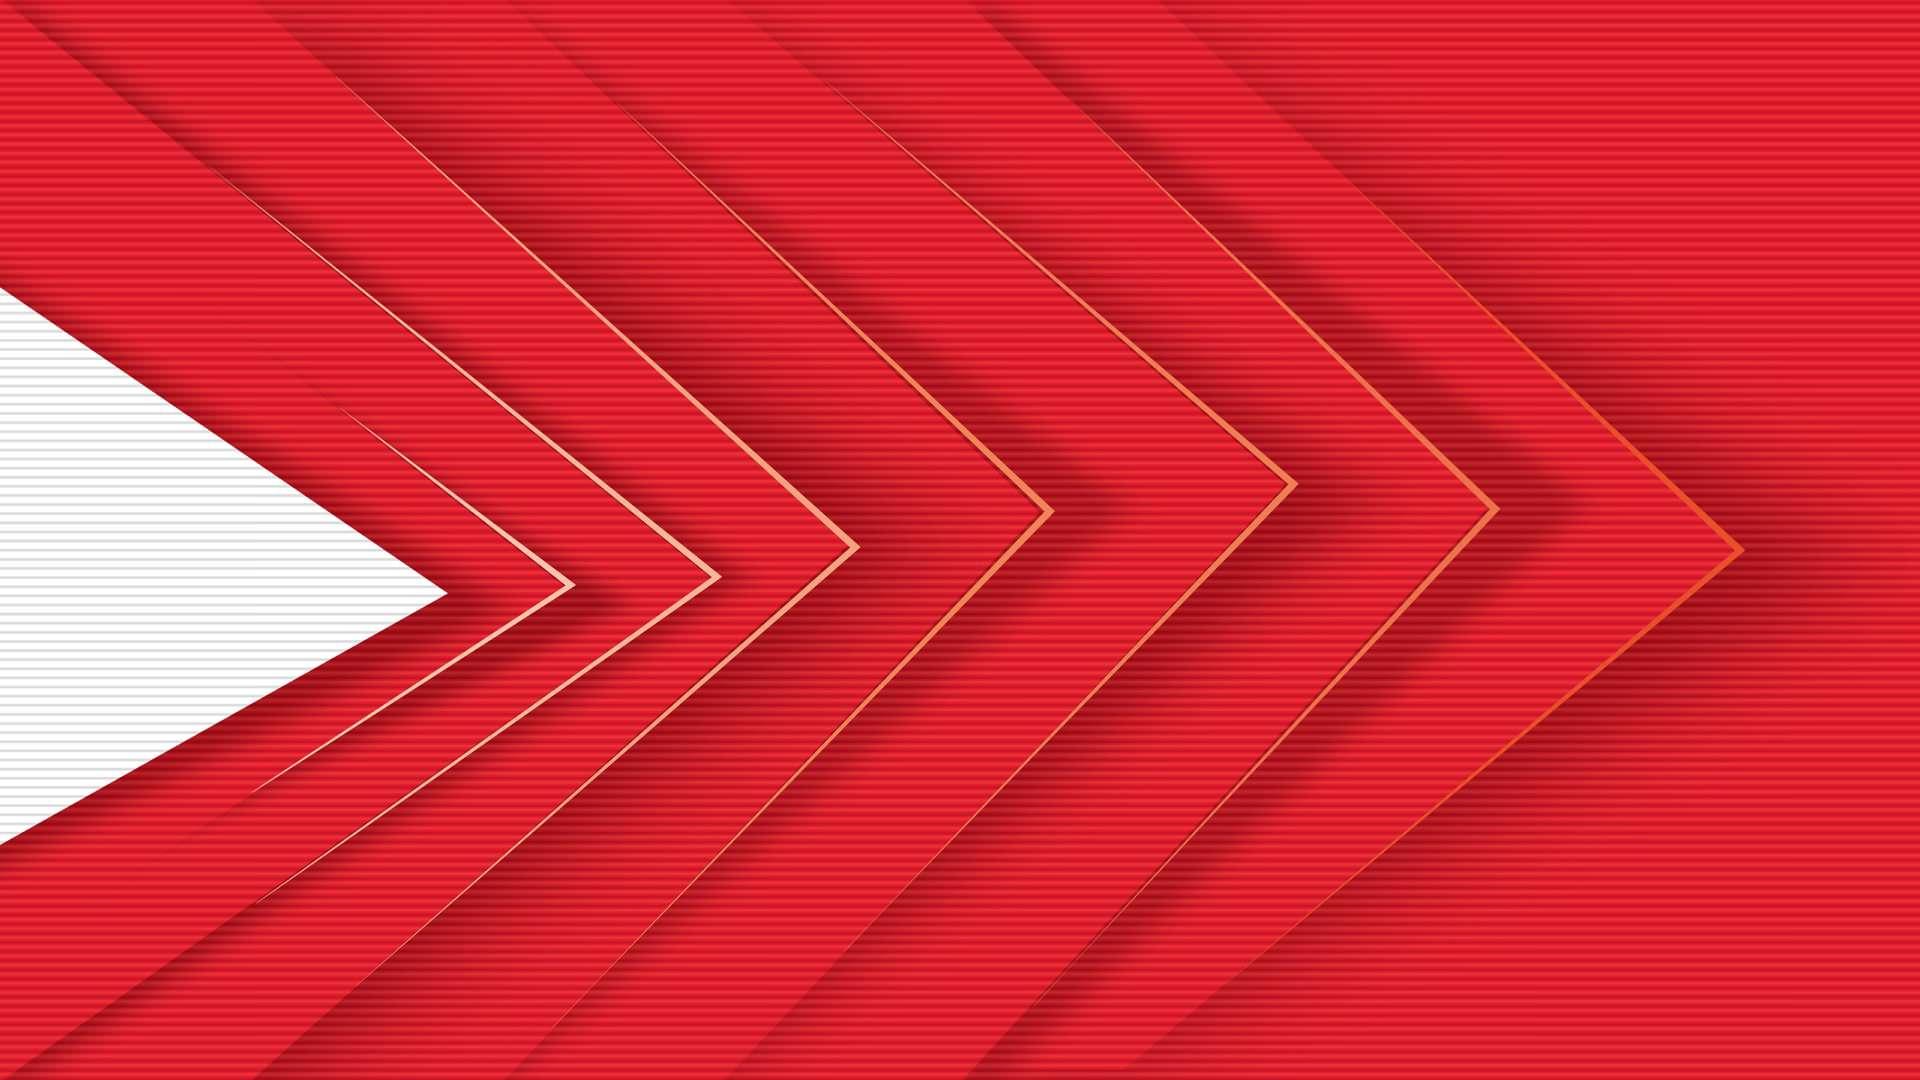 100 Mejores Wallpapers En Rojo